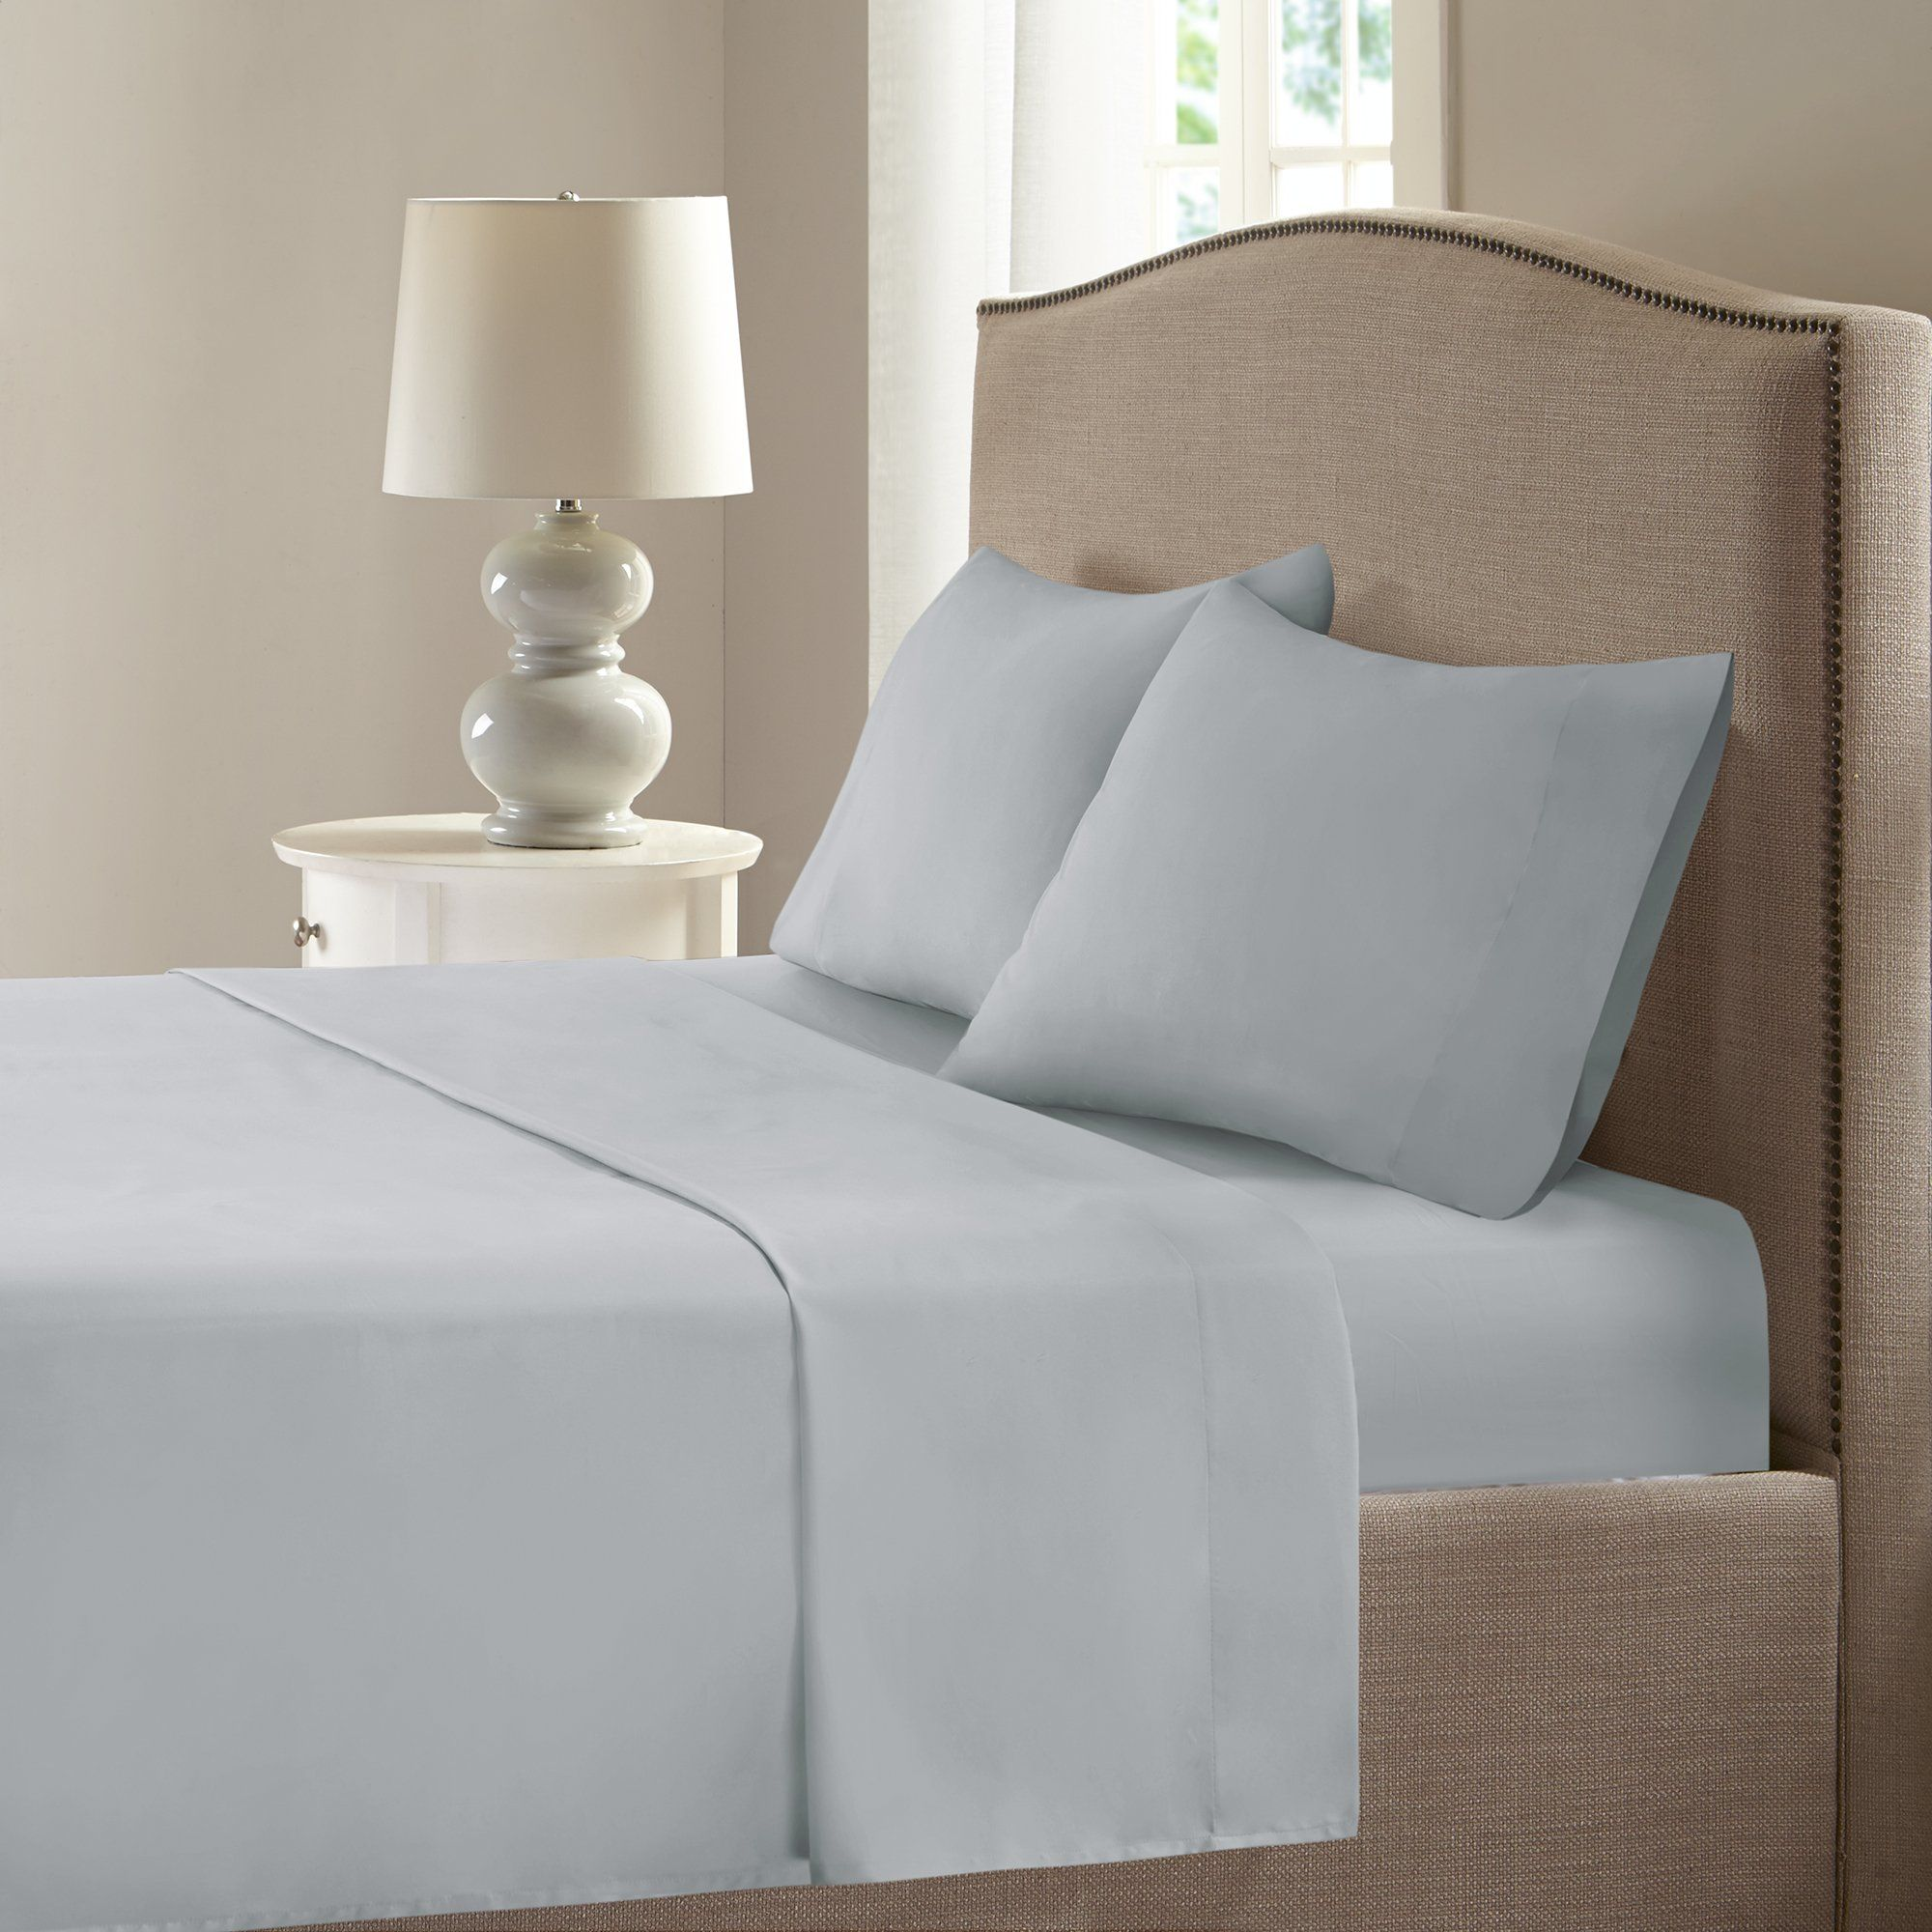 Comfort Spaces Microfiber Smart Cool Sheets Set Coolmax Fabric